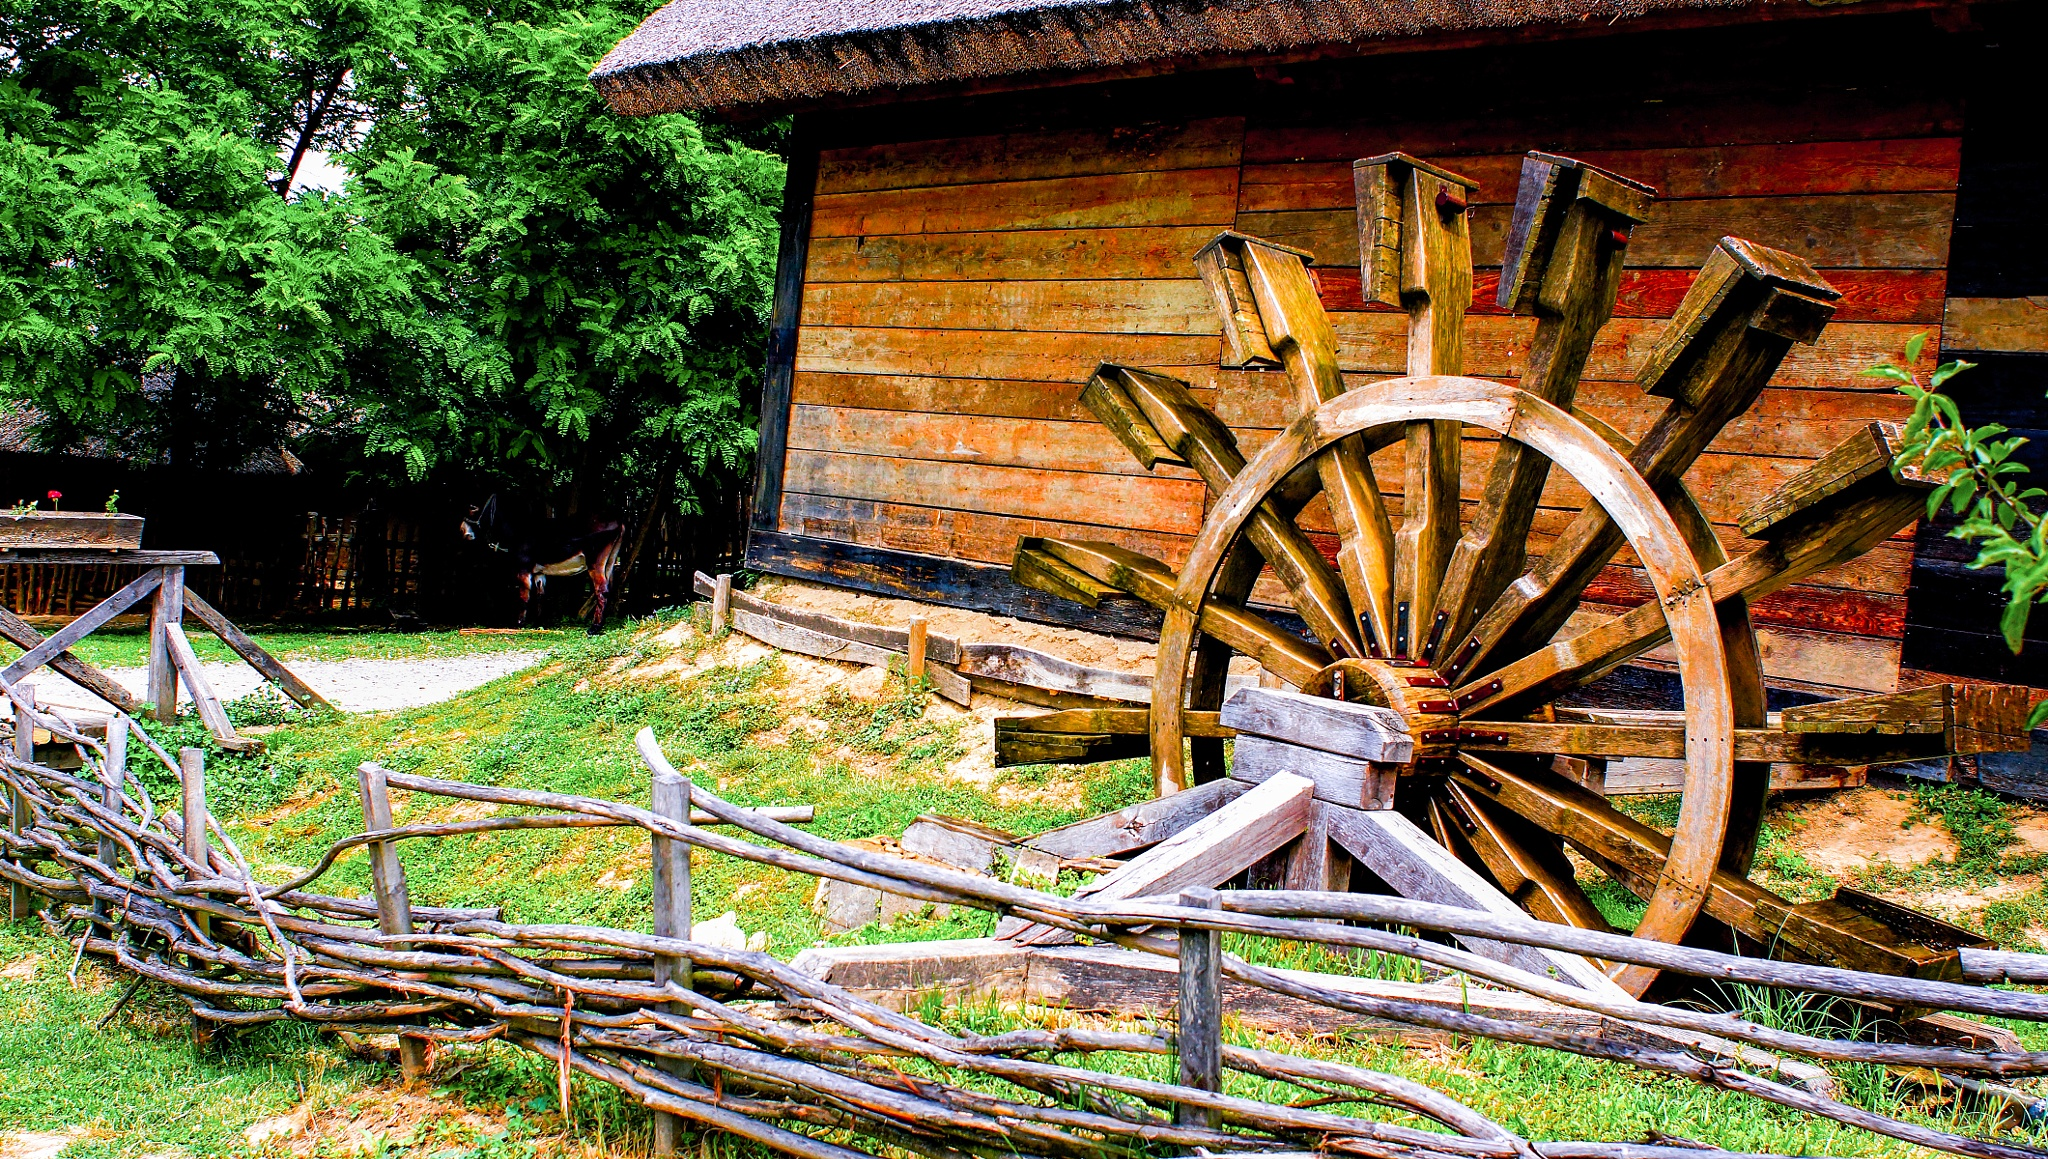 Watermill - Bikal - Hungary by Tamas Filep